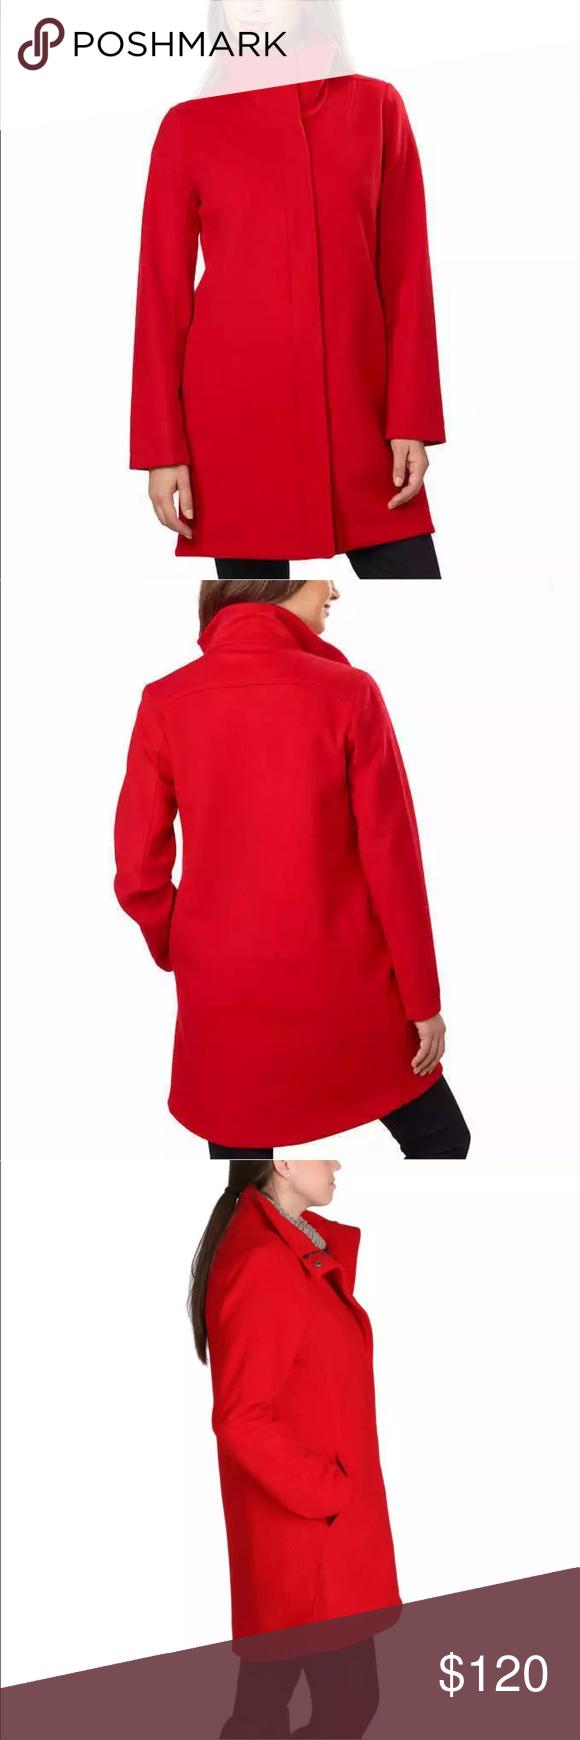 Pendleton Glacier Stripe Lined Wool Jacket Sz Xs Wool Jacket Clothes Design Pendleton [ 1740 x 580 Pixel ]